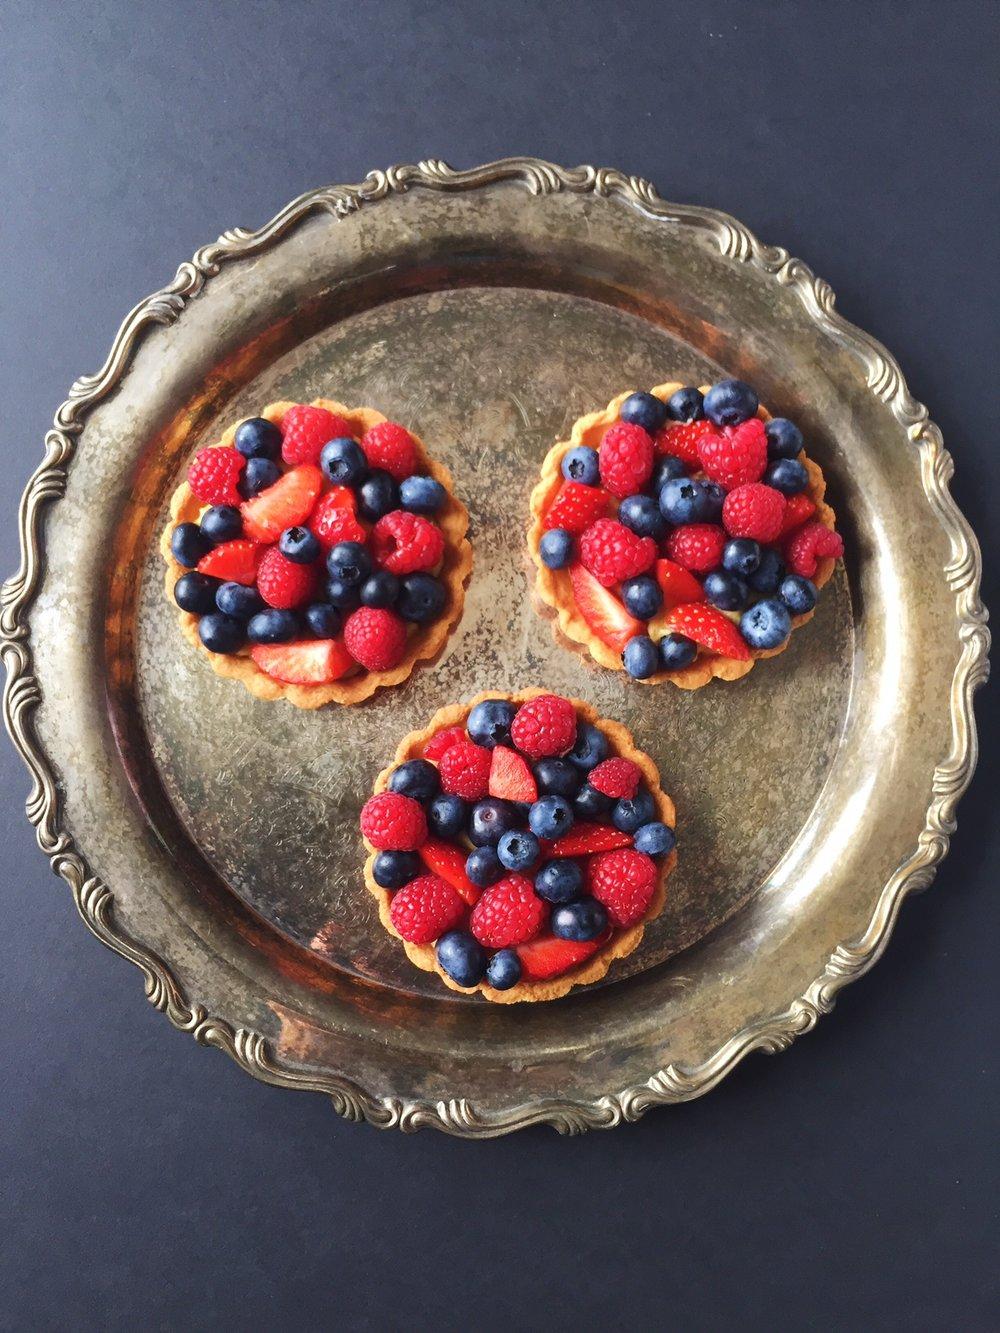 Paleo berry tarts